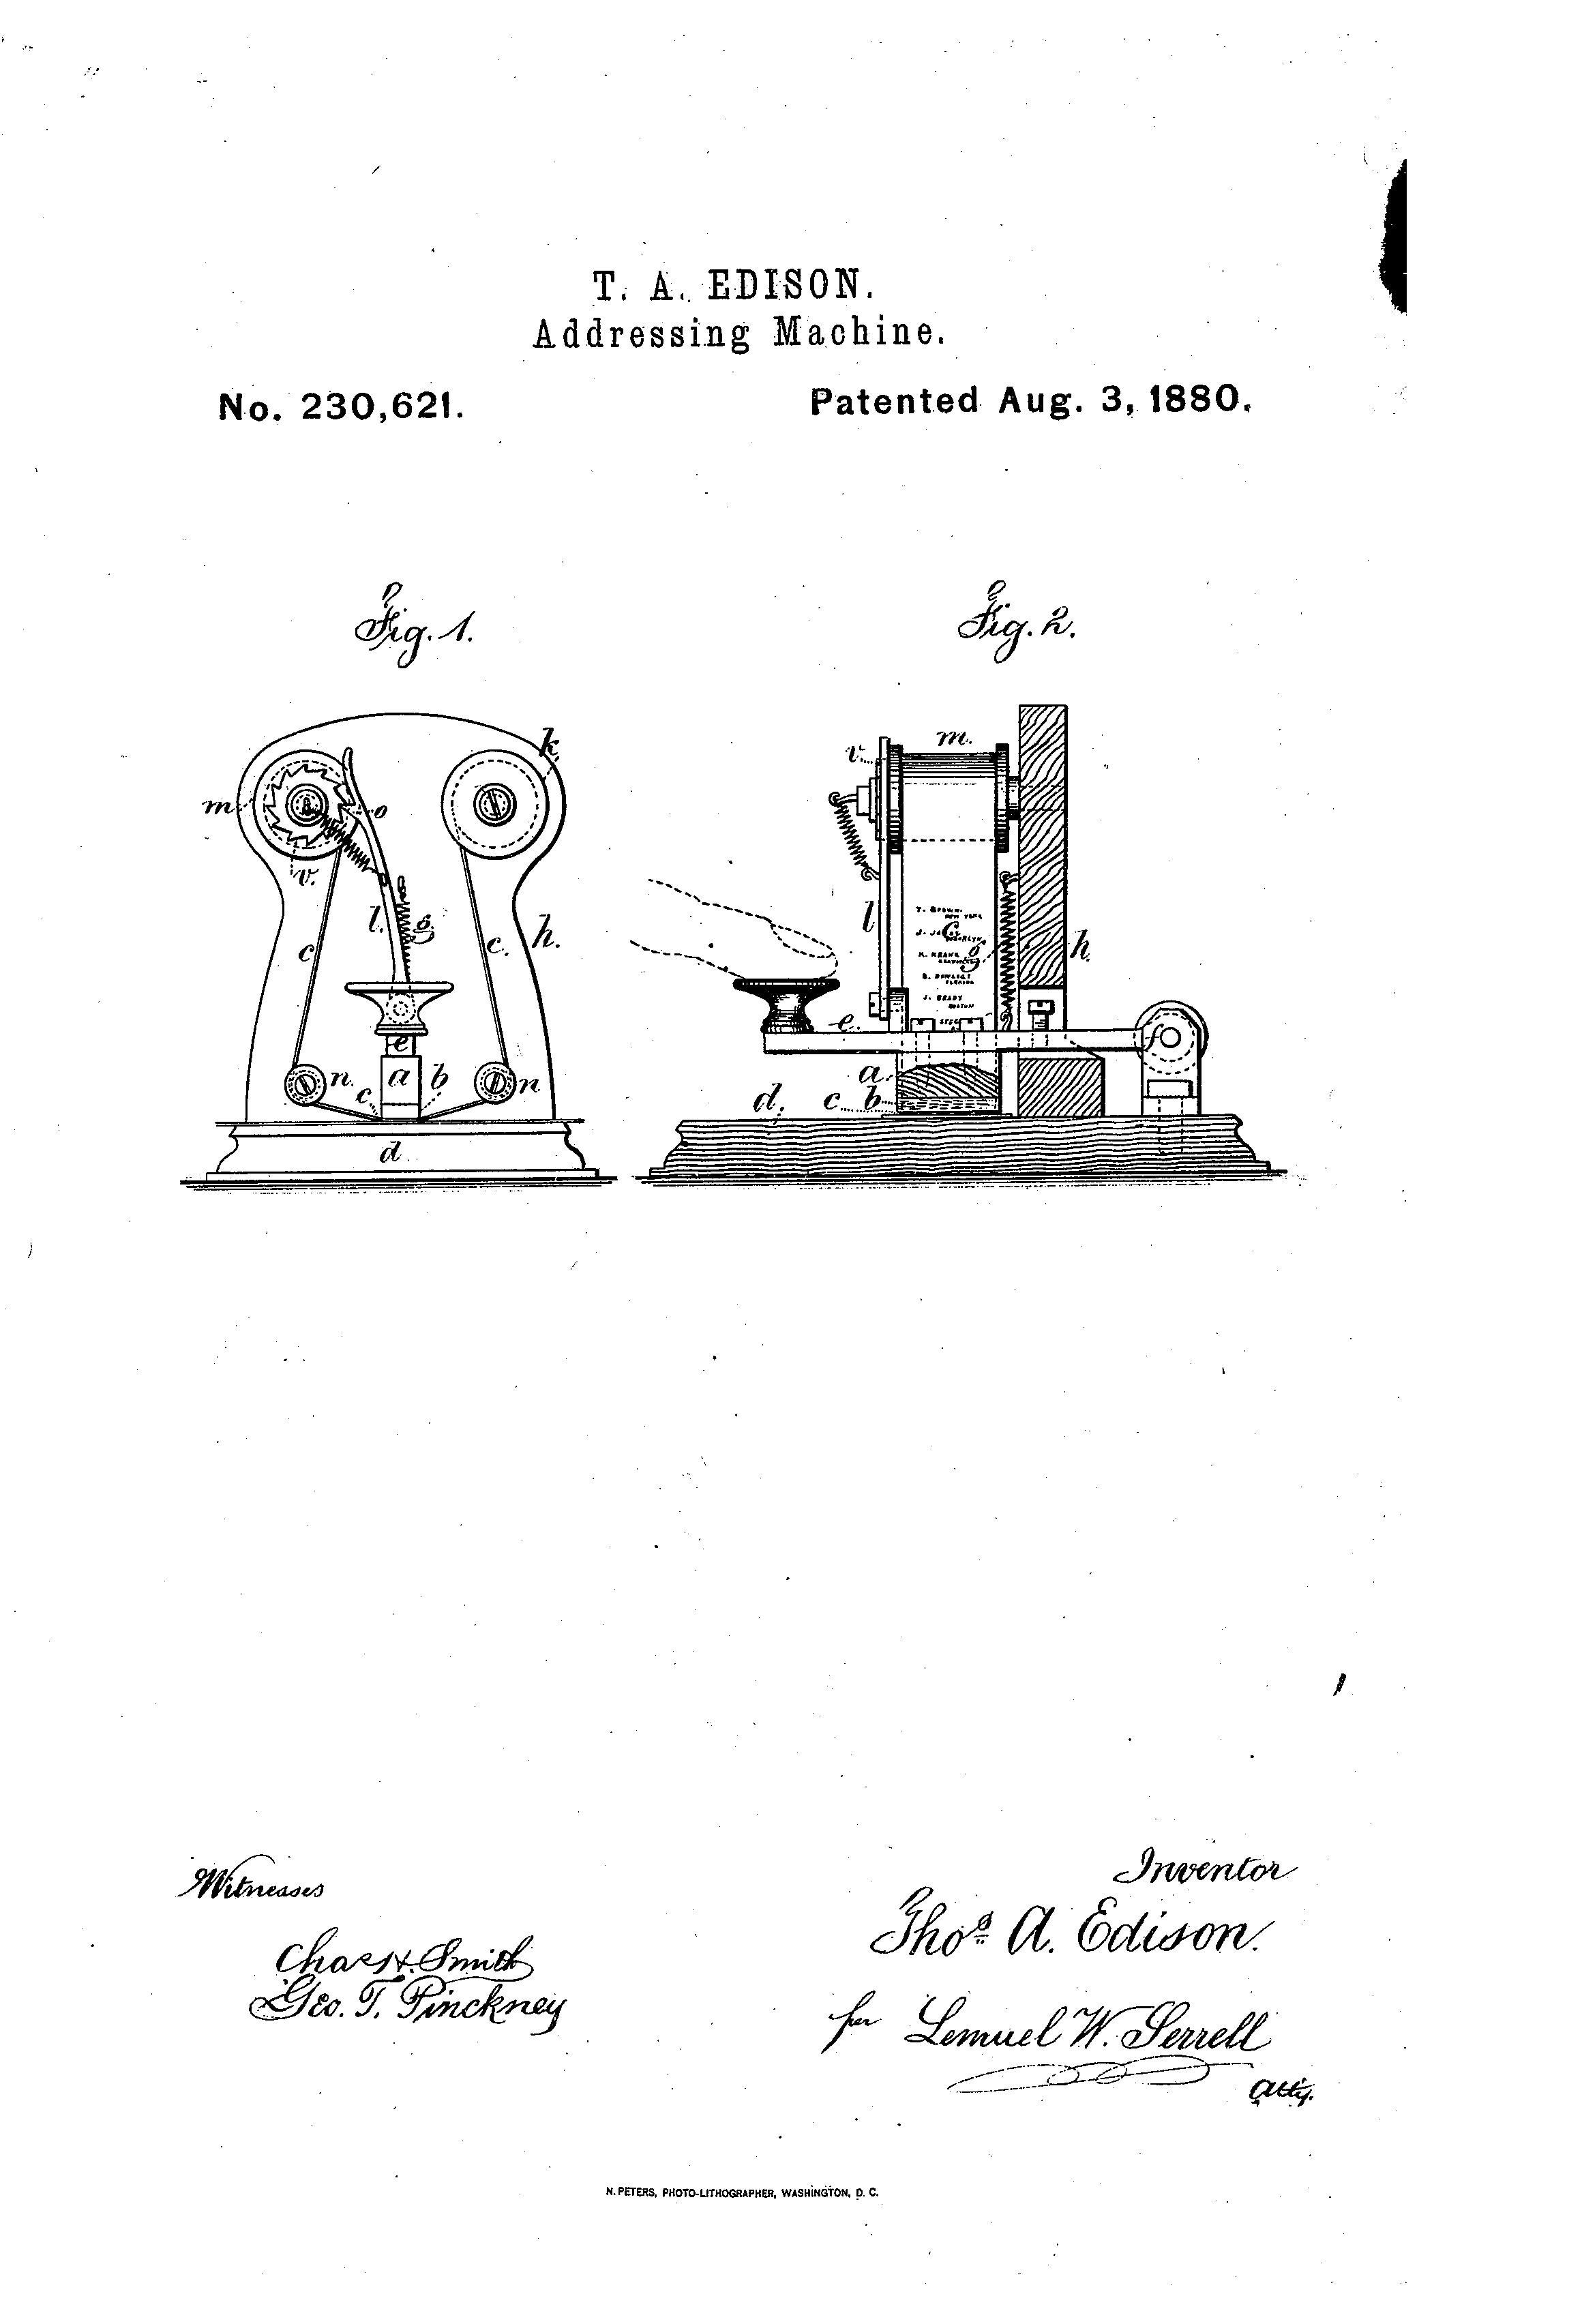 edison patents image gallery | thomas edison muckers